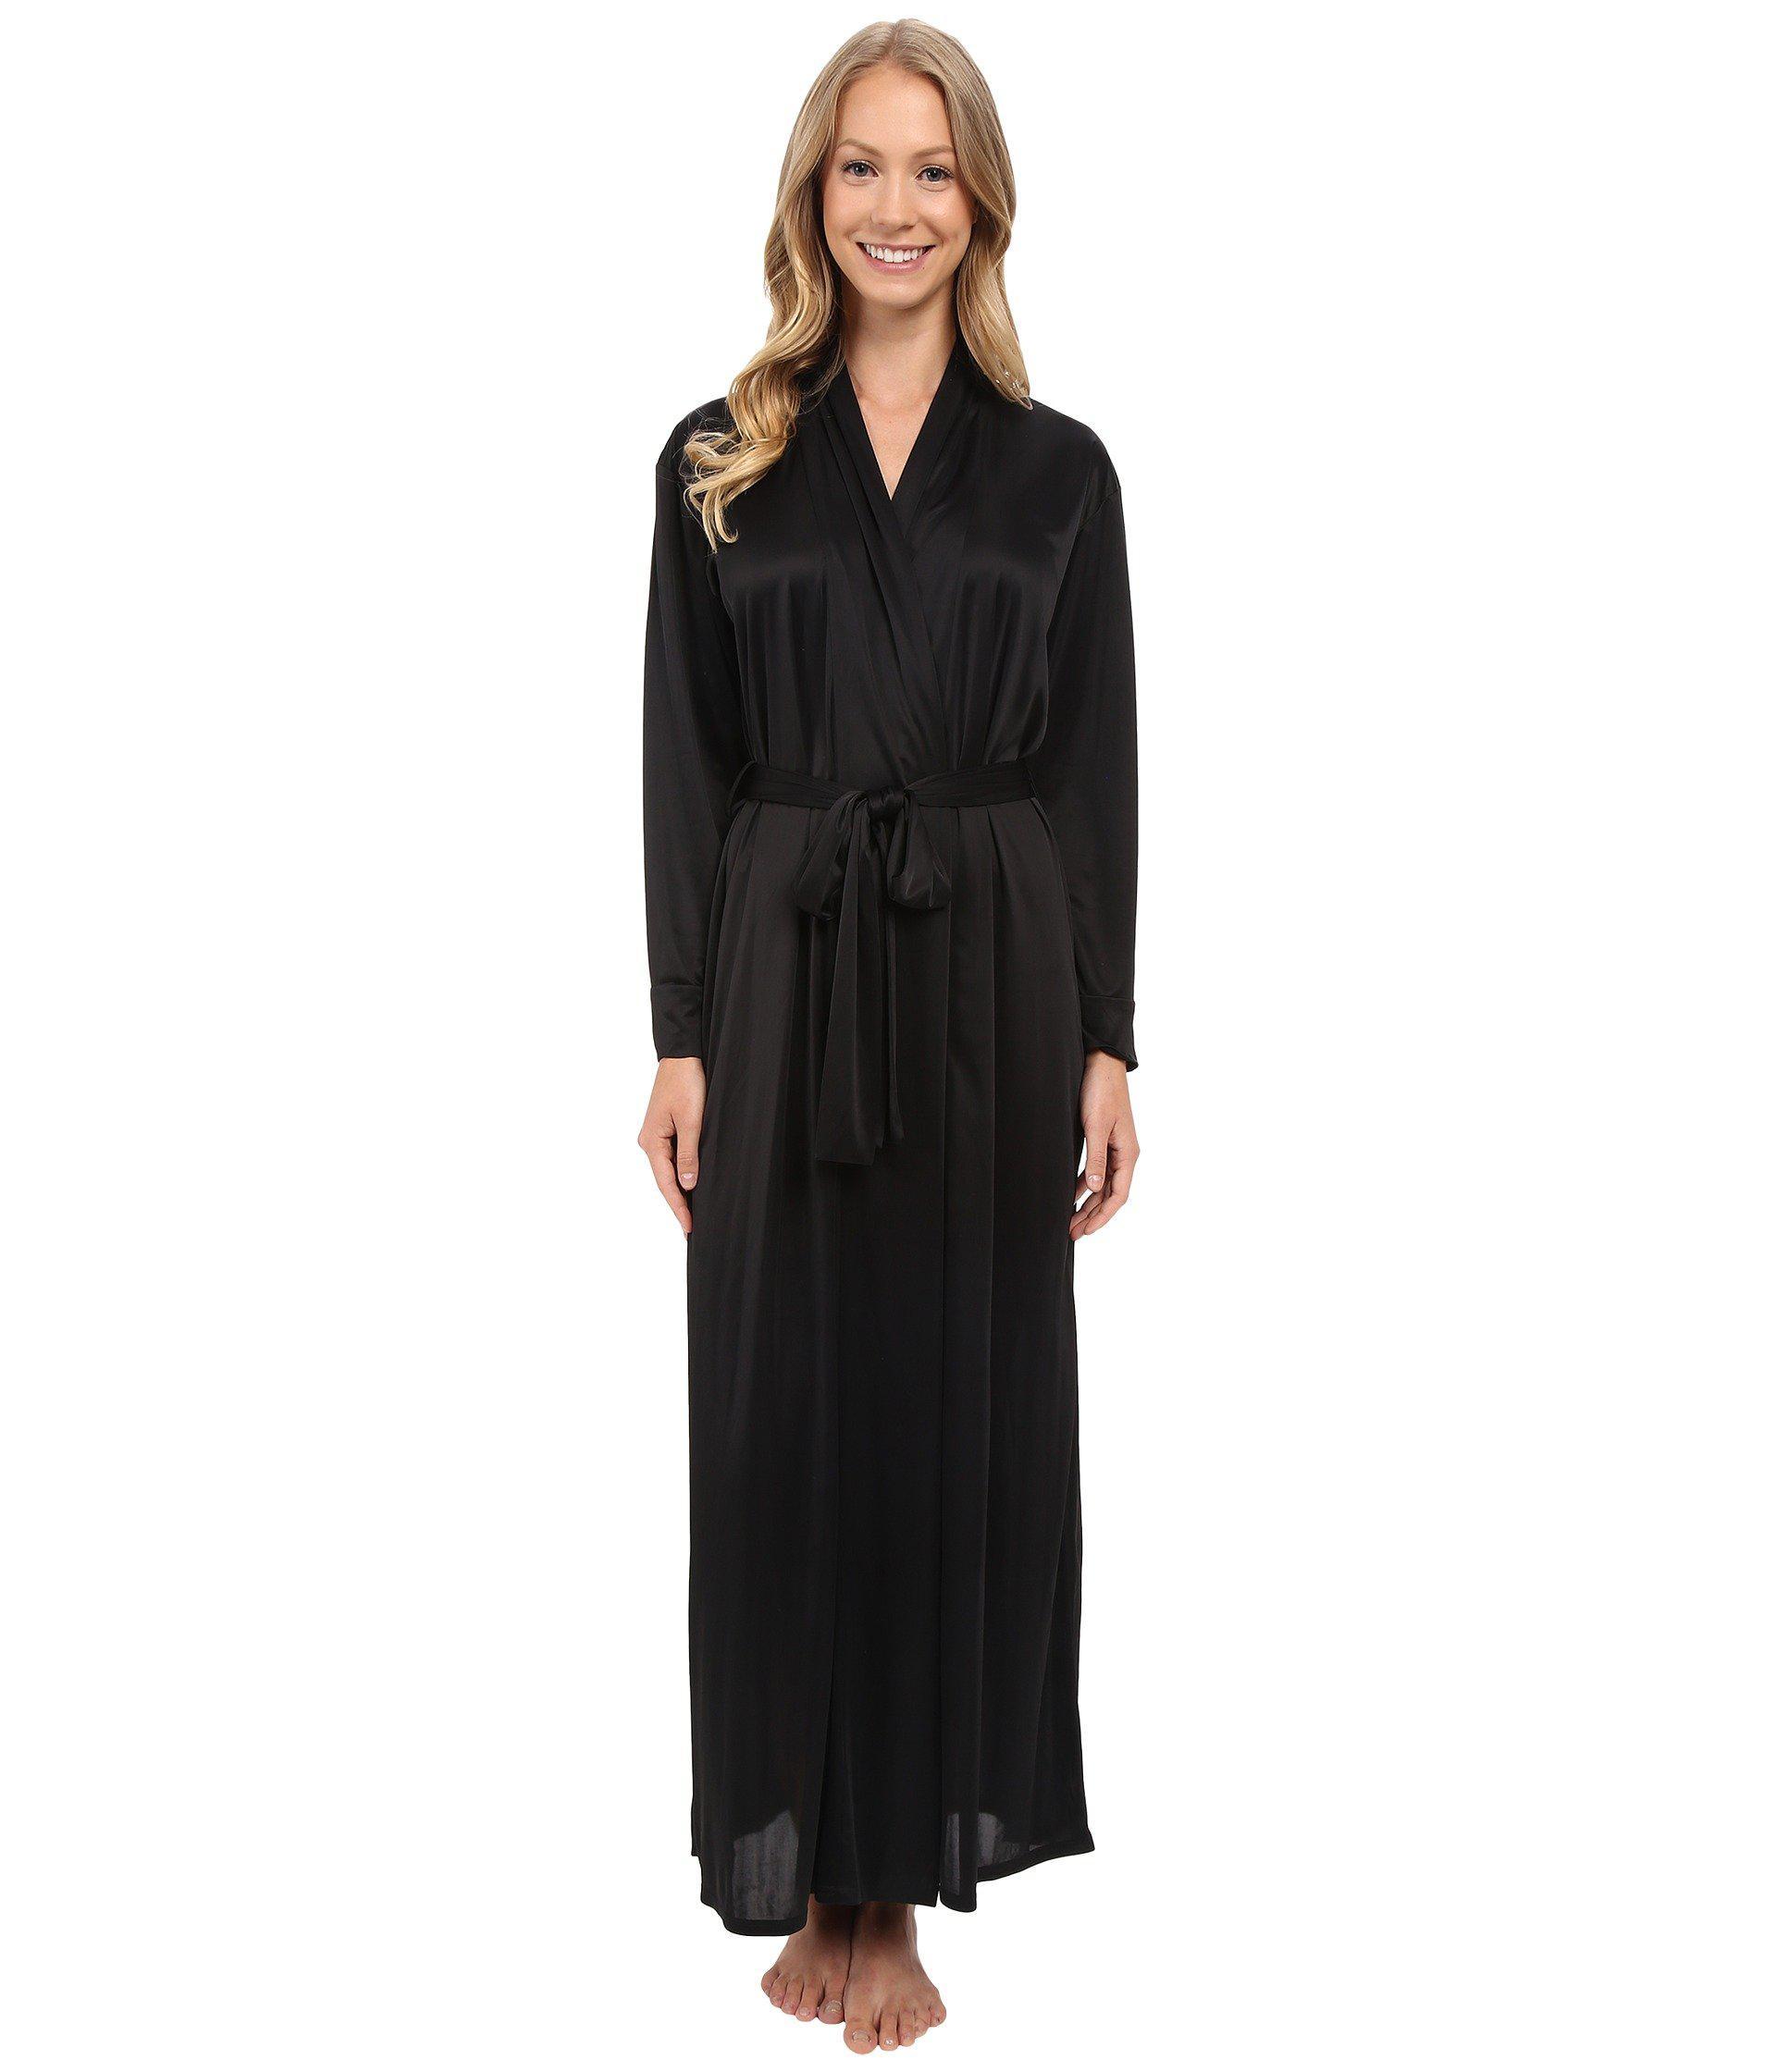 Lyst - Natori Aphrodite Robe (black) Women s Robe in Black 05db41778